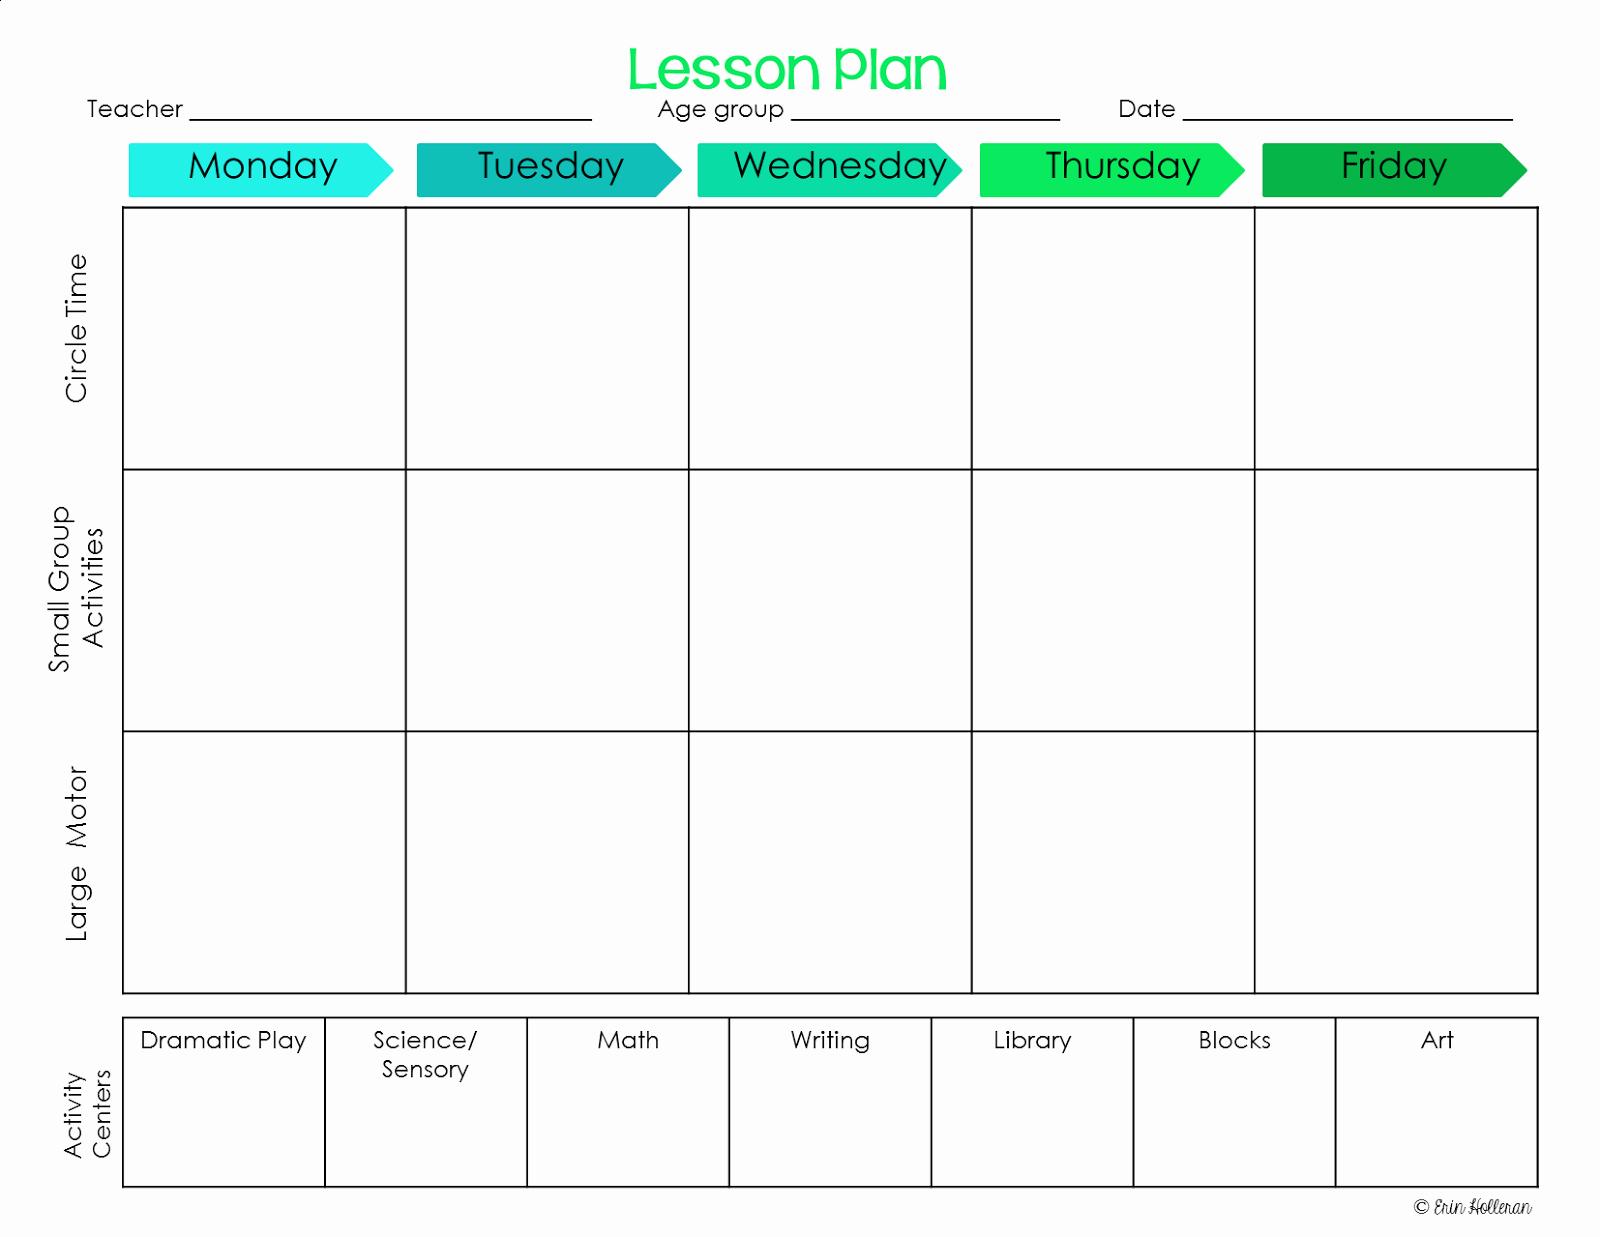 Free Preschool Lesson Plan Template Unique Elegant Free Printable Preschool Lesson Plan Template